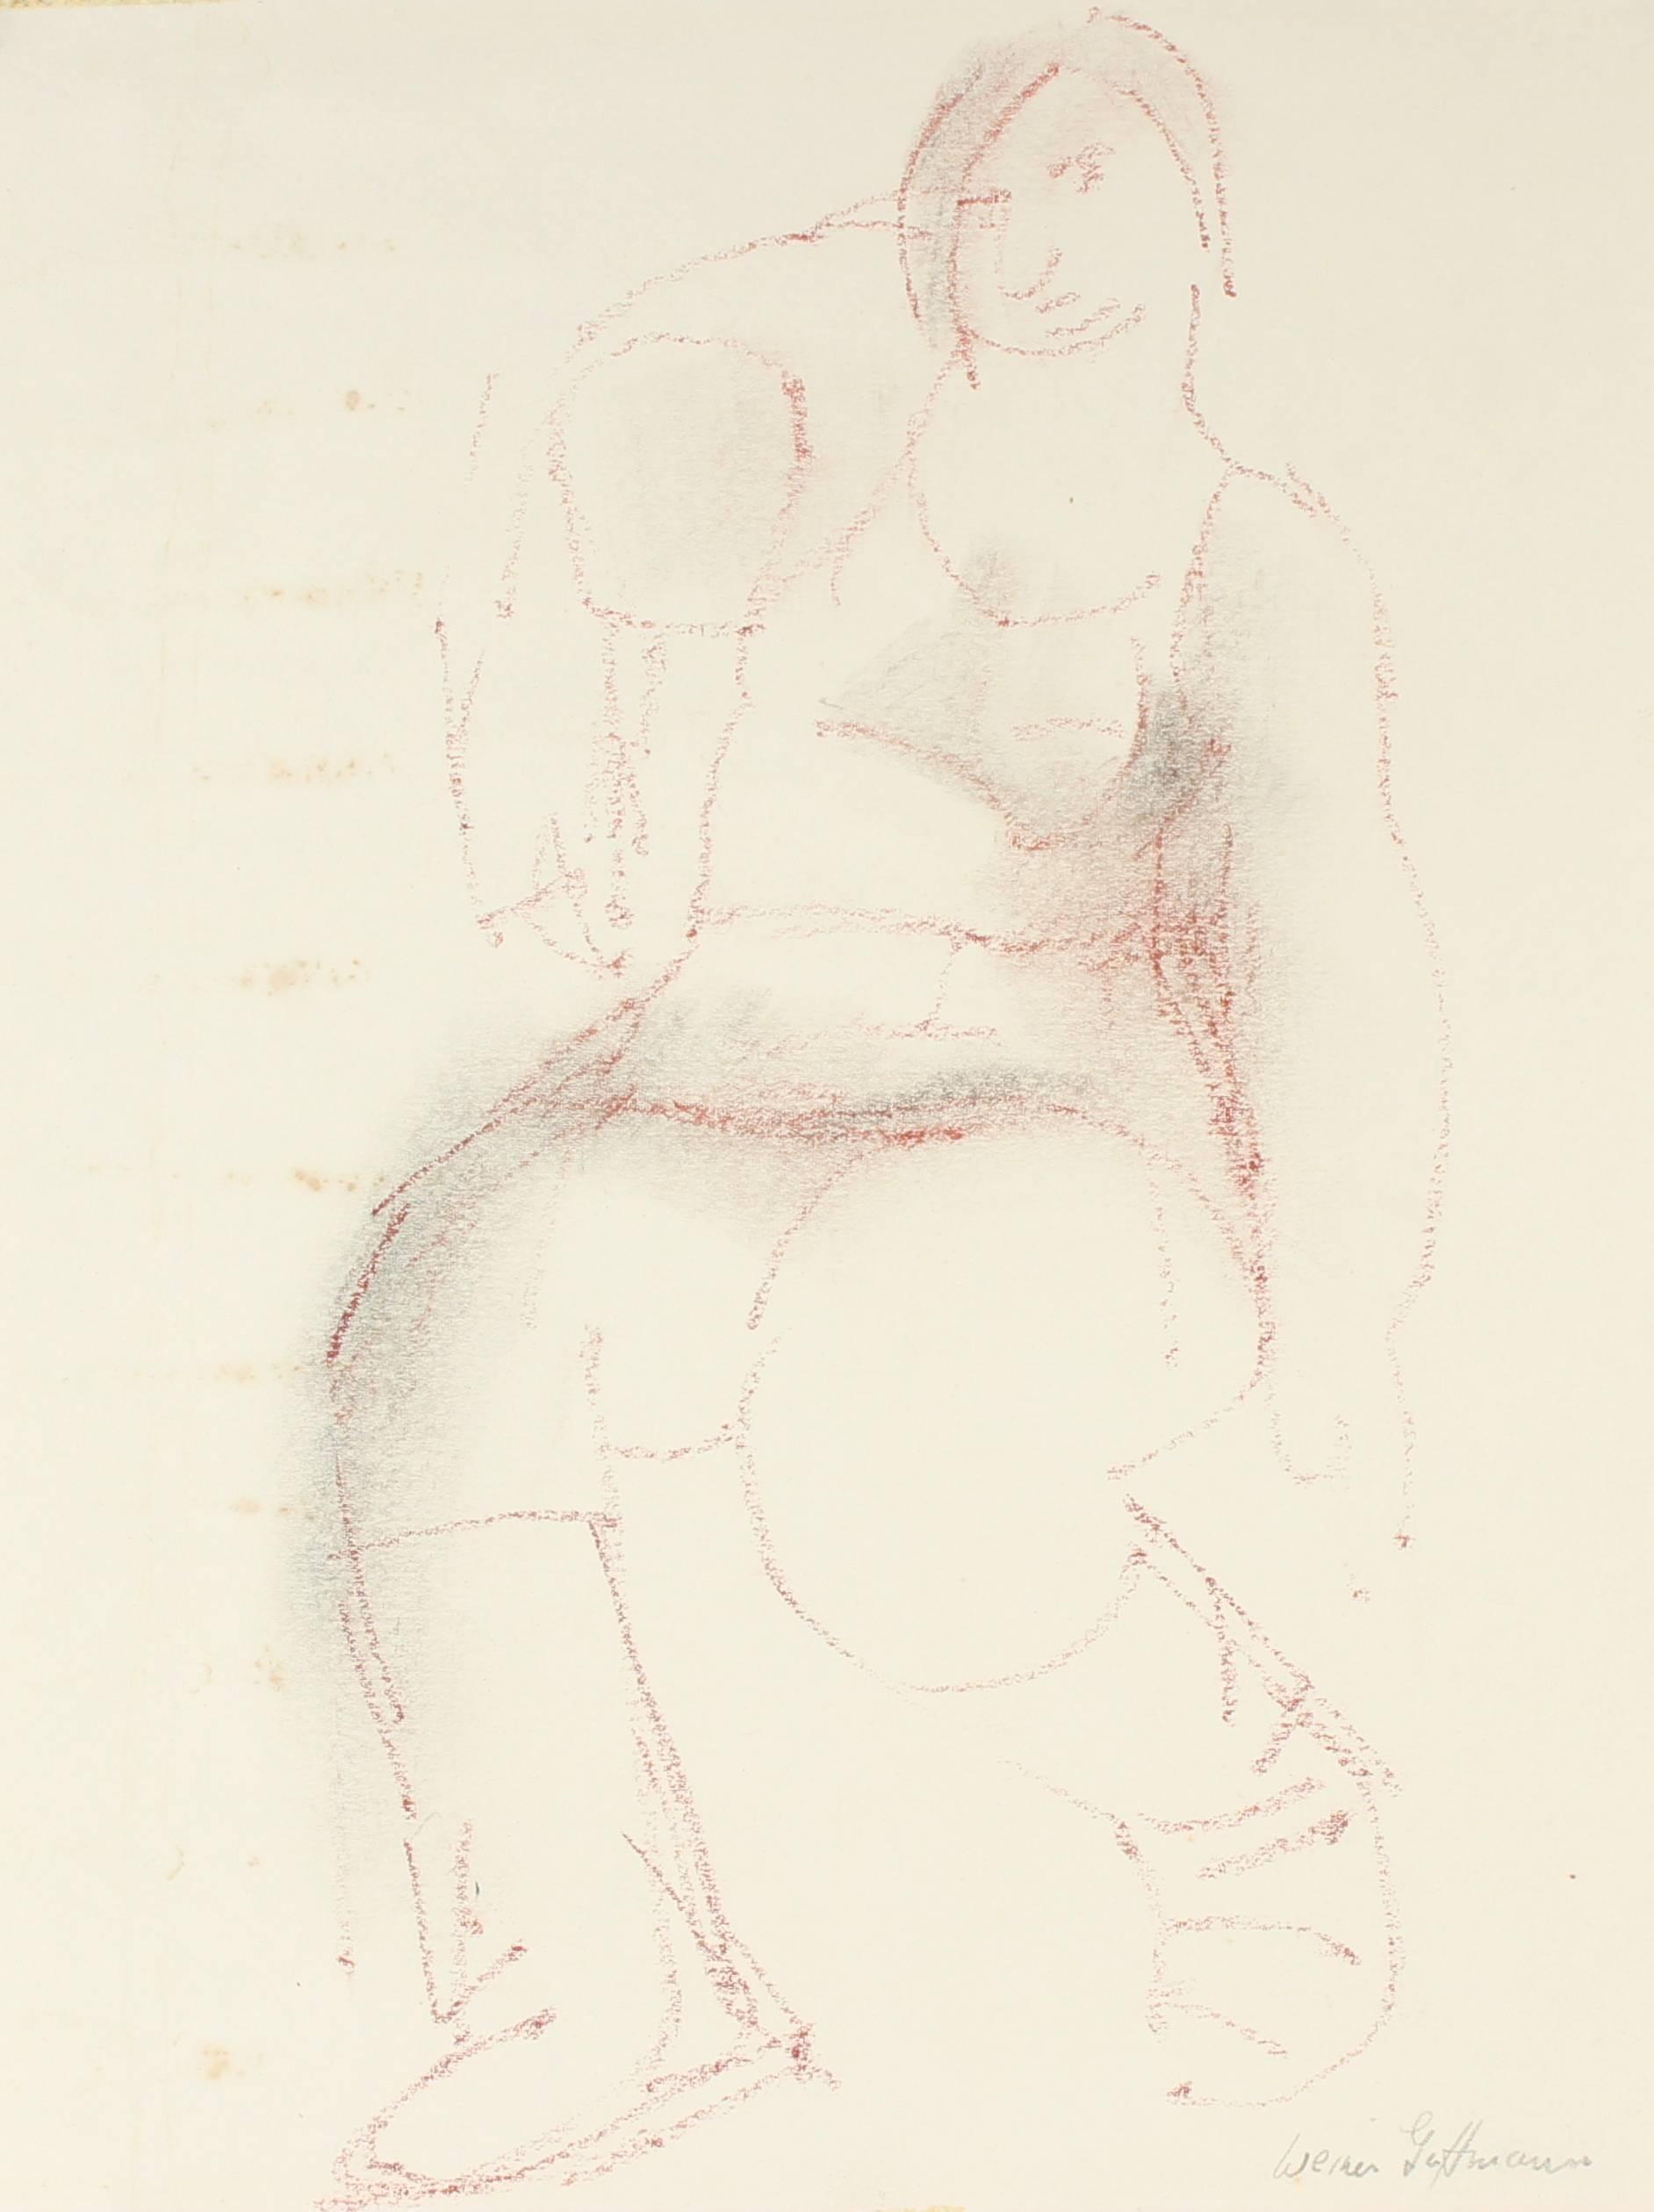 Minimal Expressionist Portrait in Graphite, Mid 20th Century